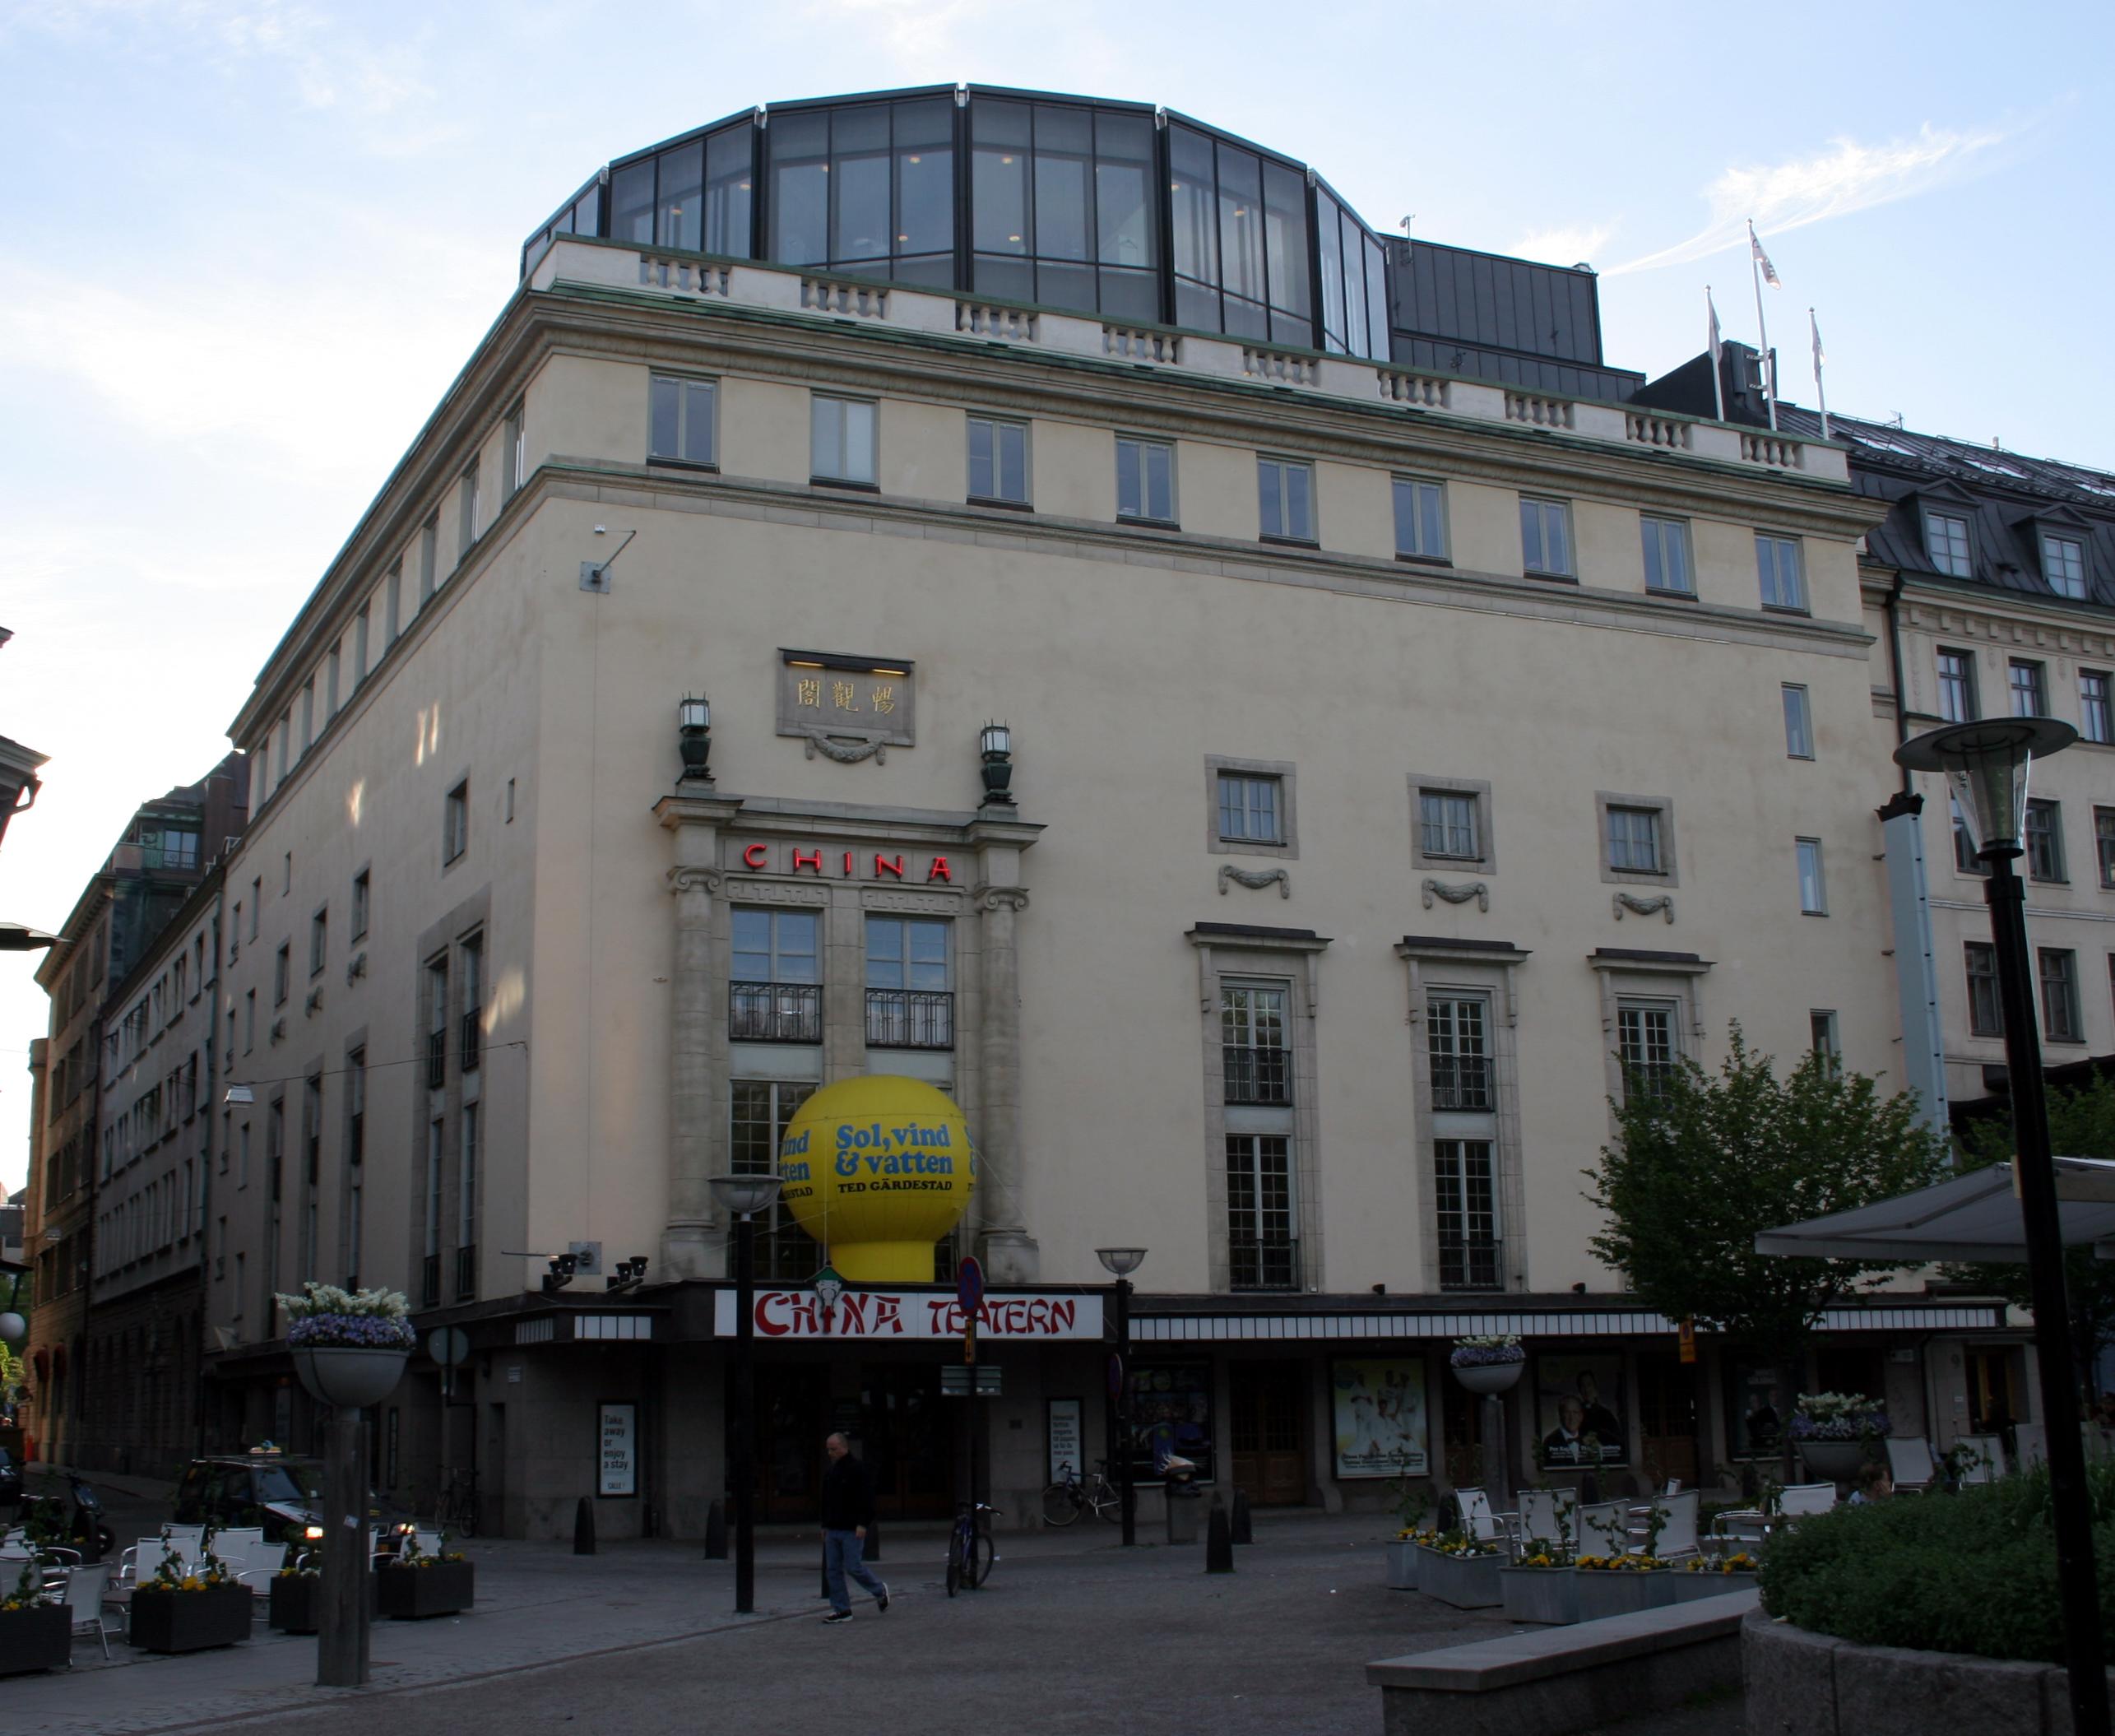 kammar chinesse daska i Stockholm